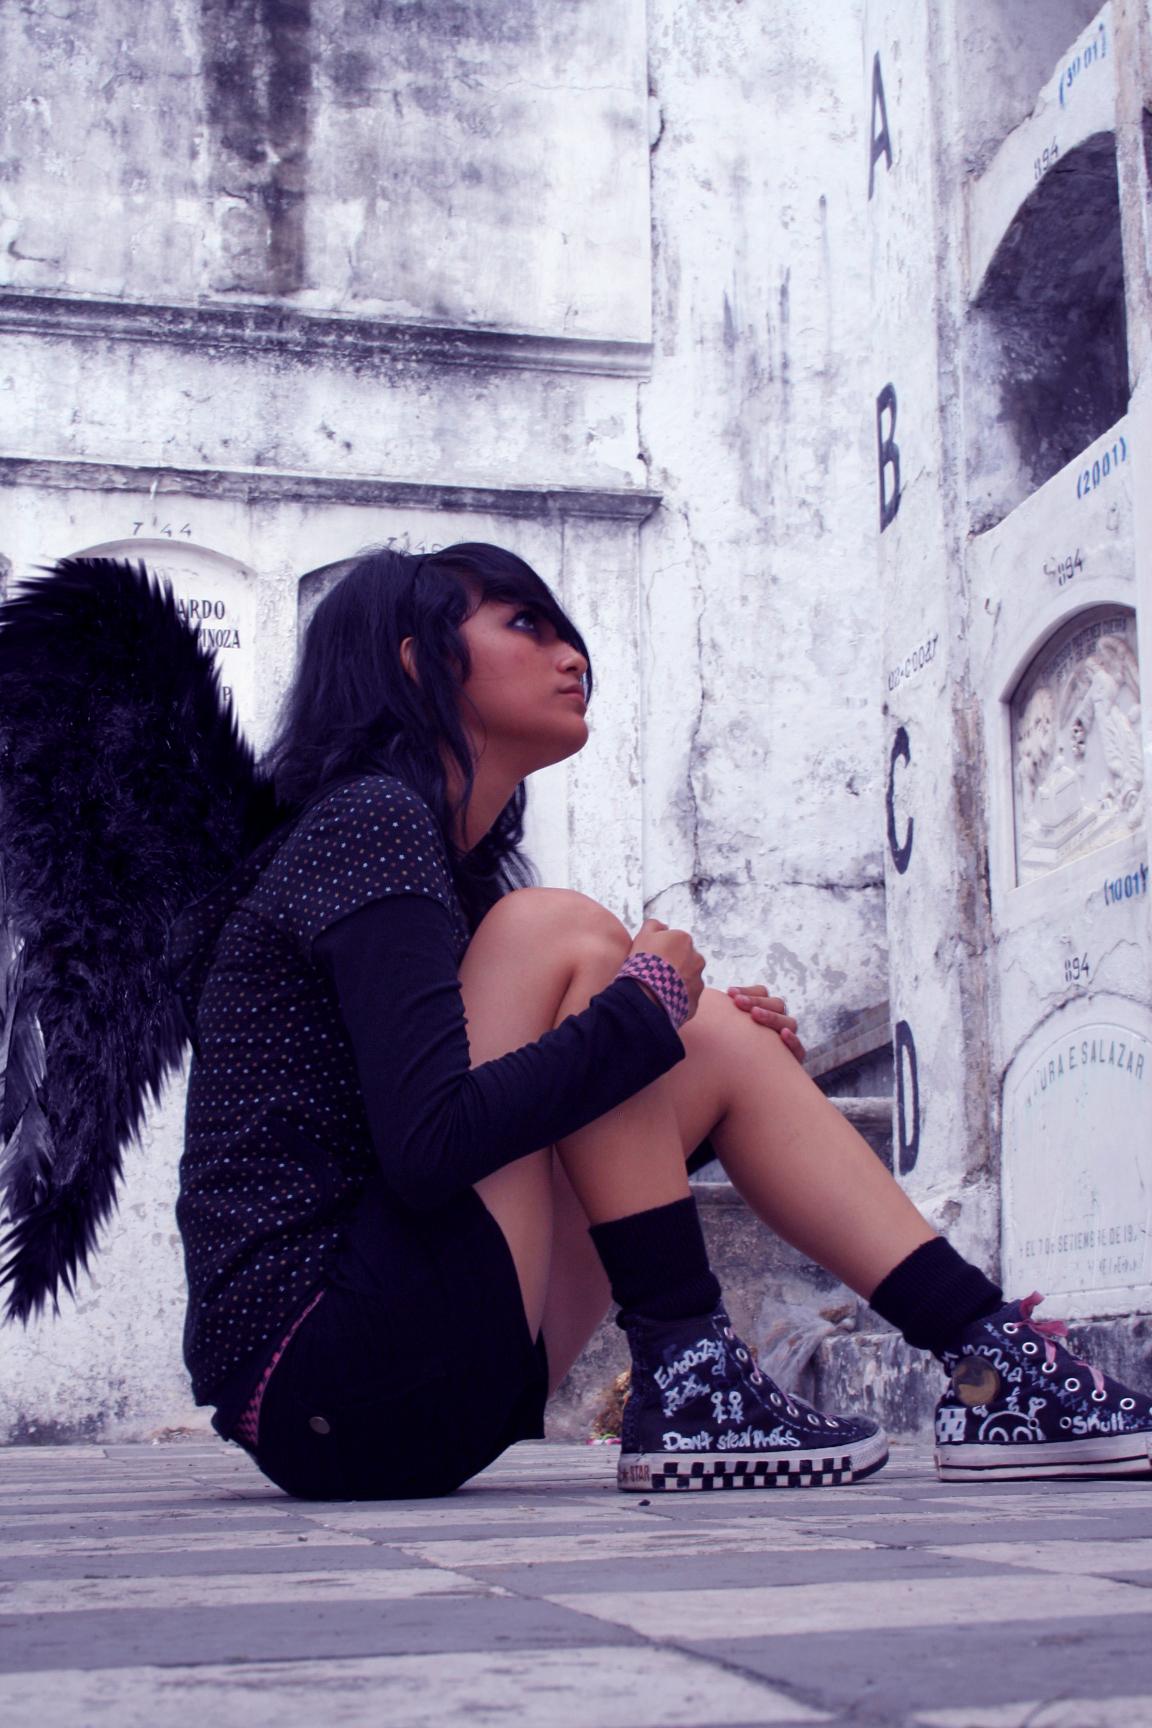 emo_girl_by_firekitty29-d4r35uf